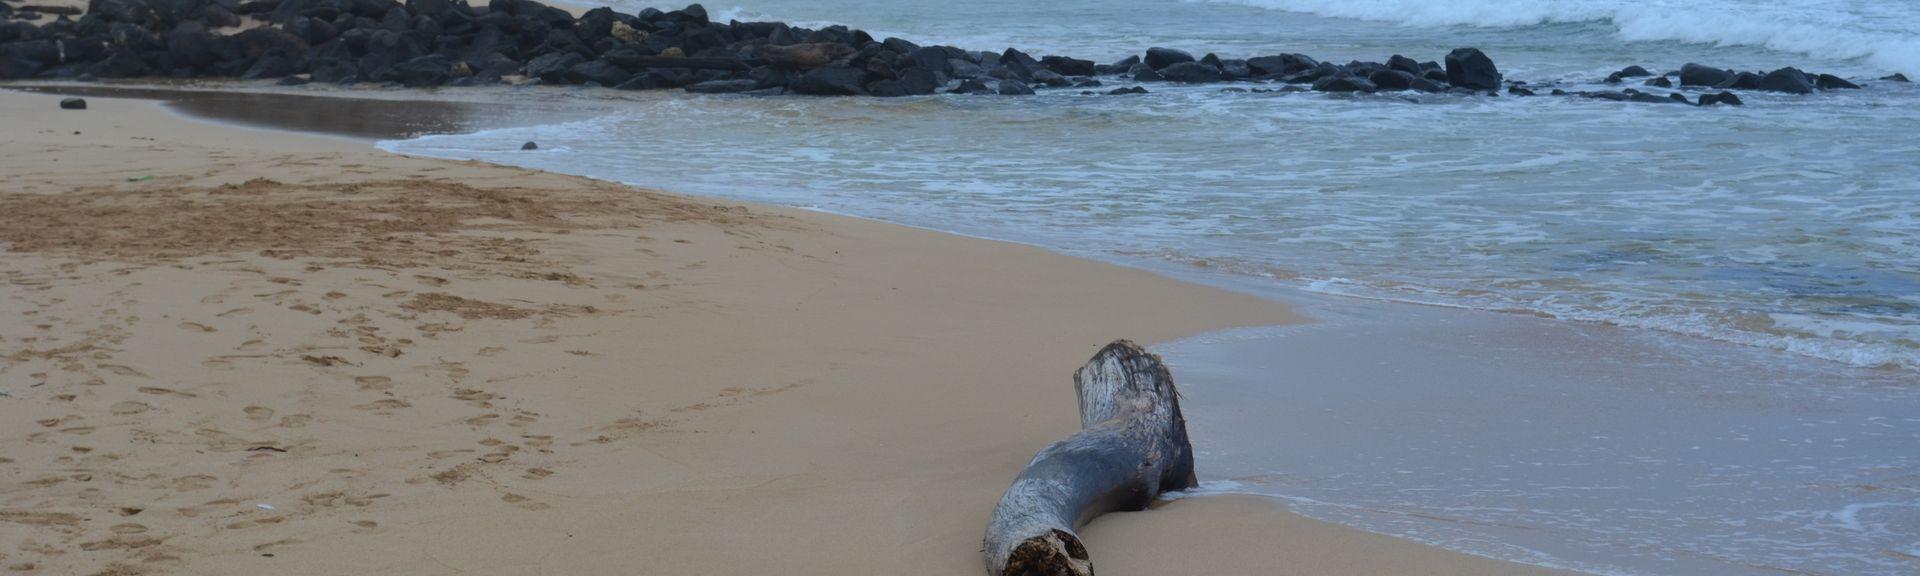 Kauai Beach Resort (Hanamaulu, Hawái, Estados Unidos)